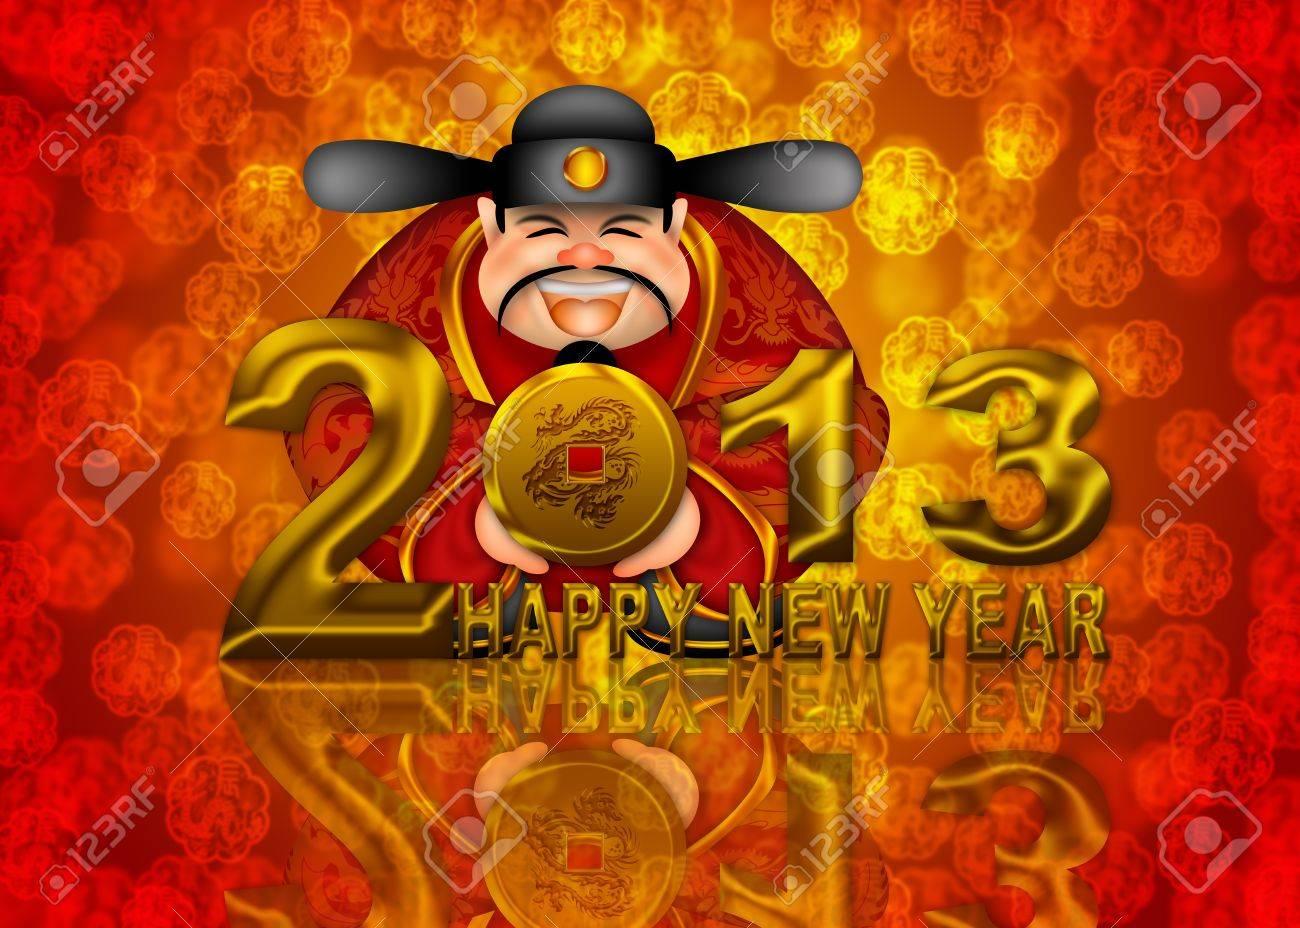 2013 Happy New Year Chinese Money Prosperity God Holding Round Gold Dragon Coin Illustration Stock Photo - 14962432